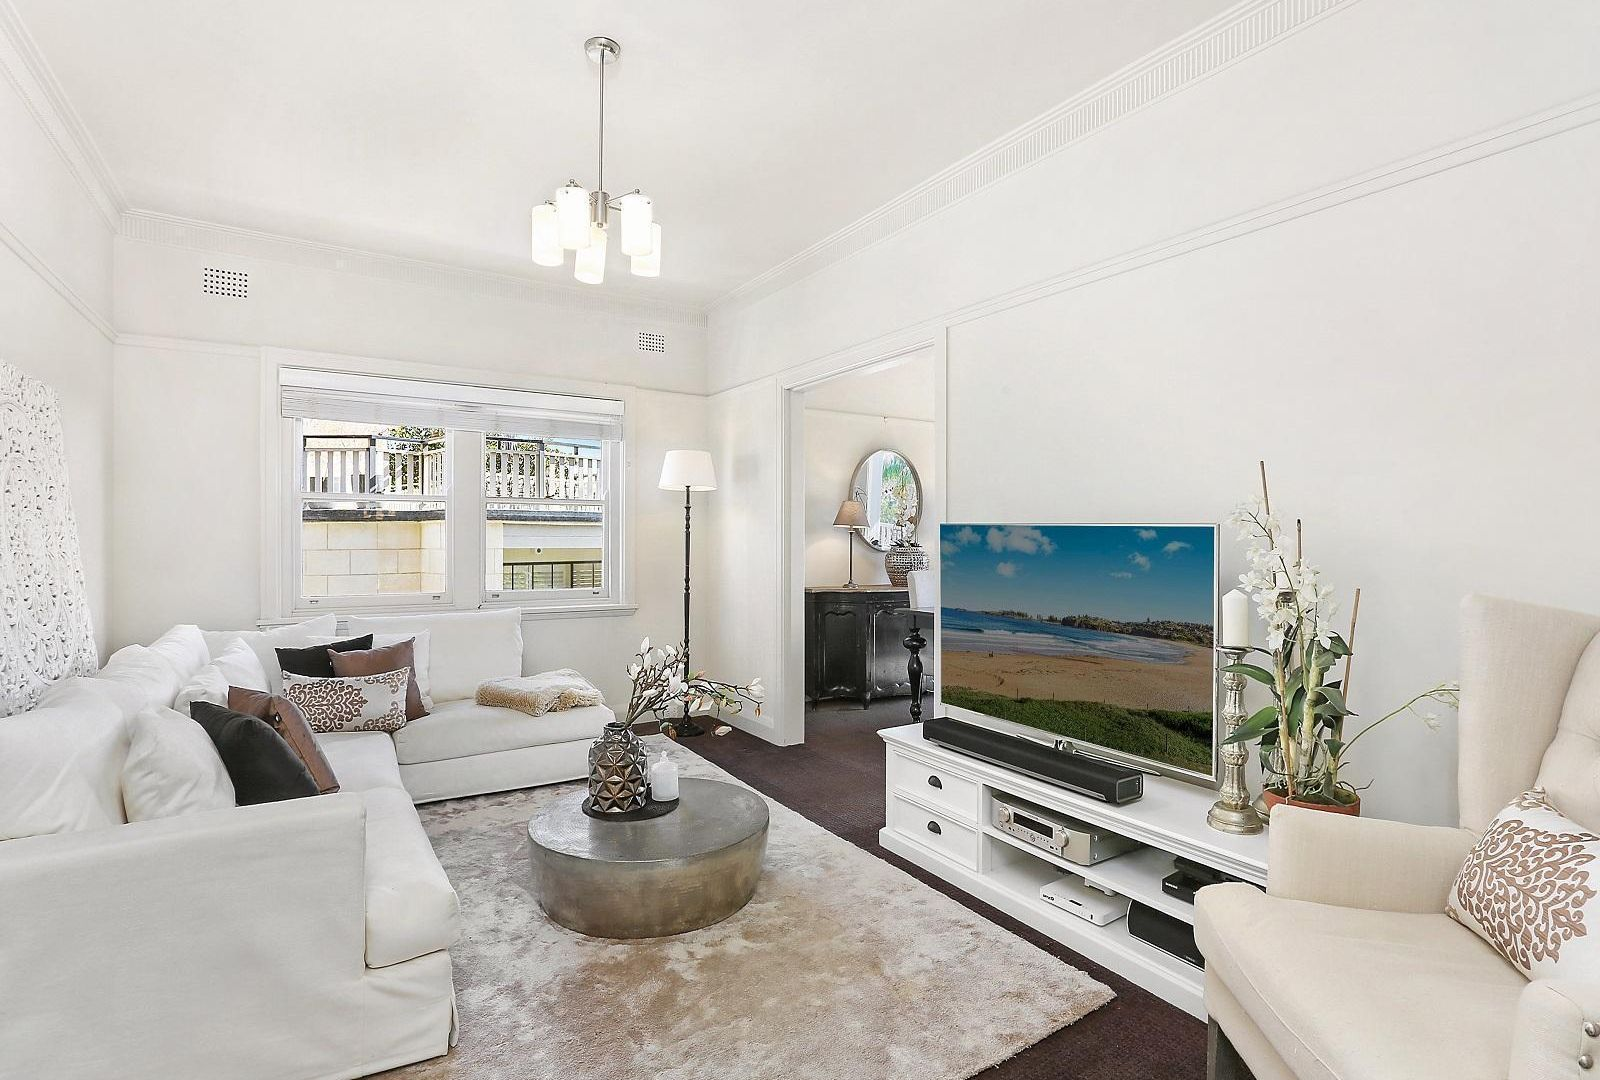 3/8A Mosman Street, Mosman NSW 2088, Image 1